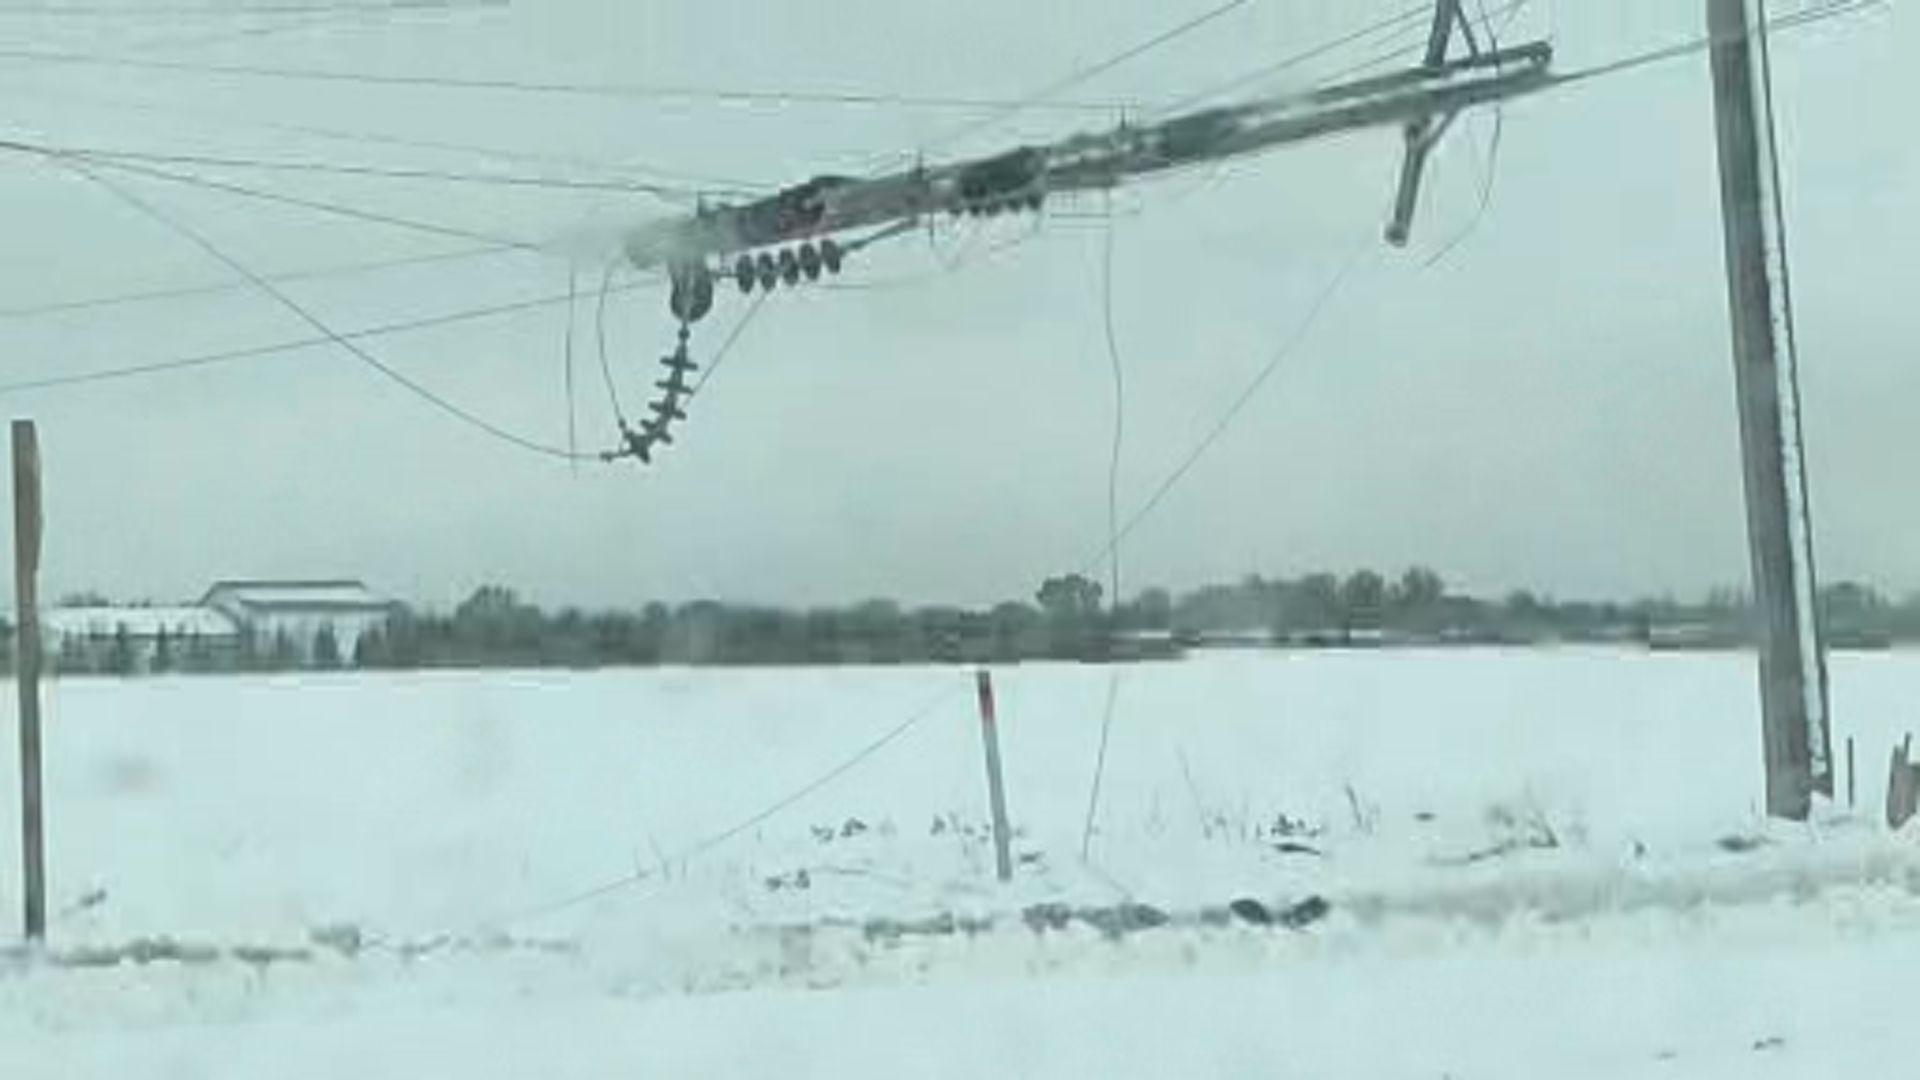 Bruce Owen on Manitoba Hydro and storm damage